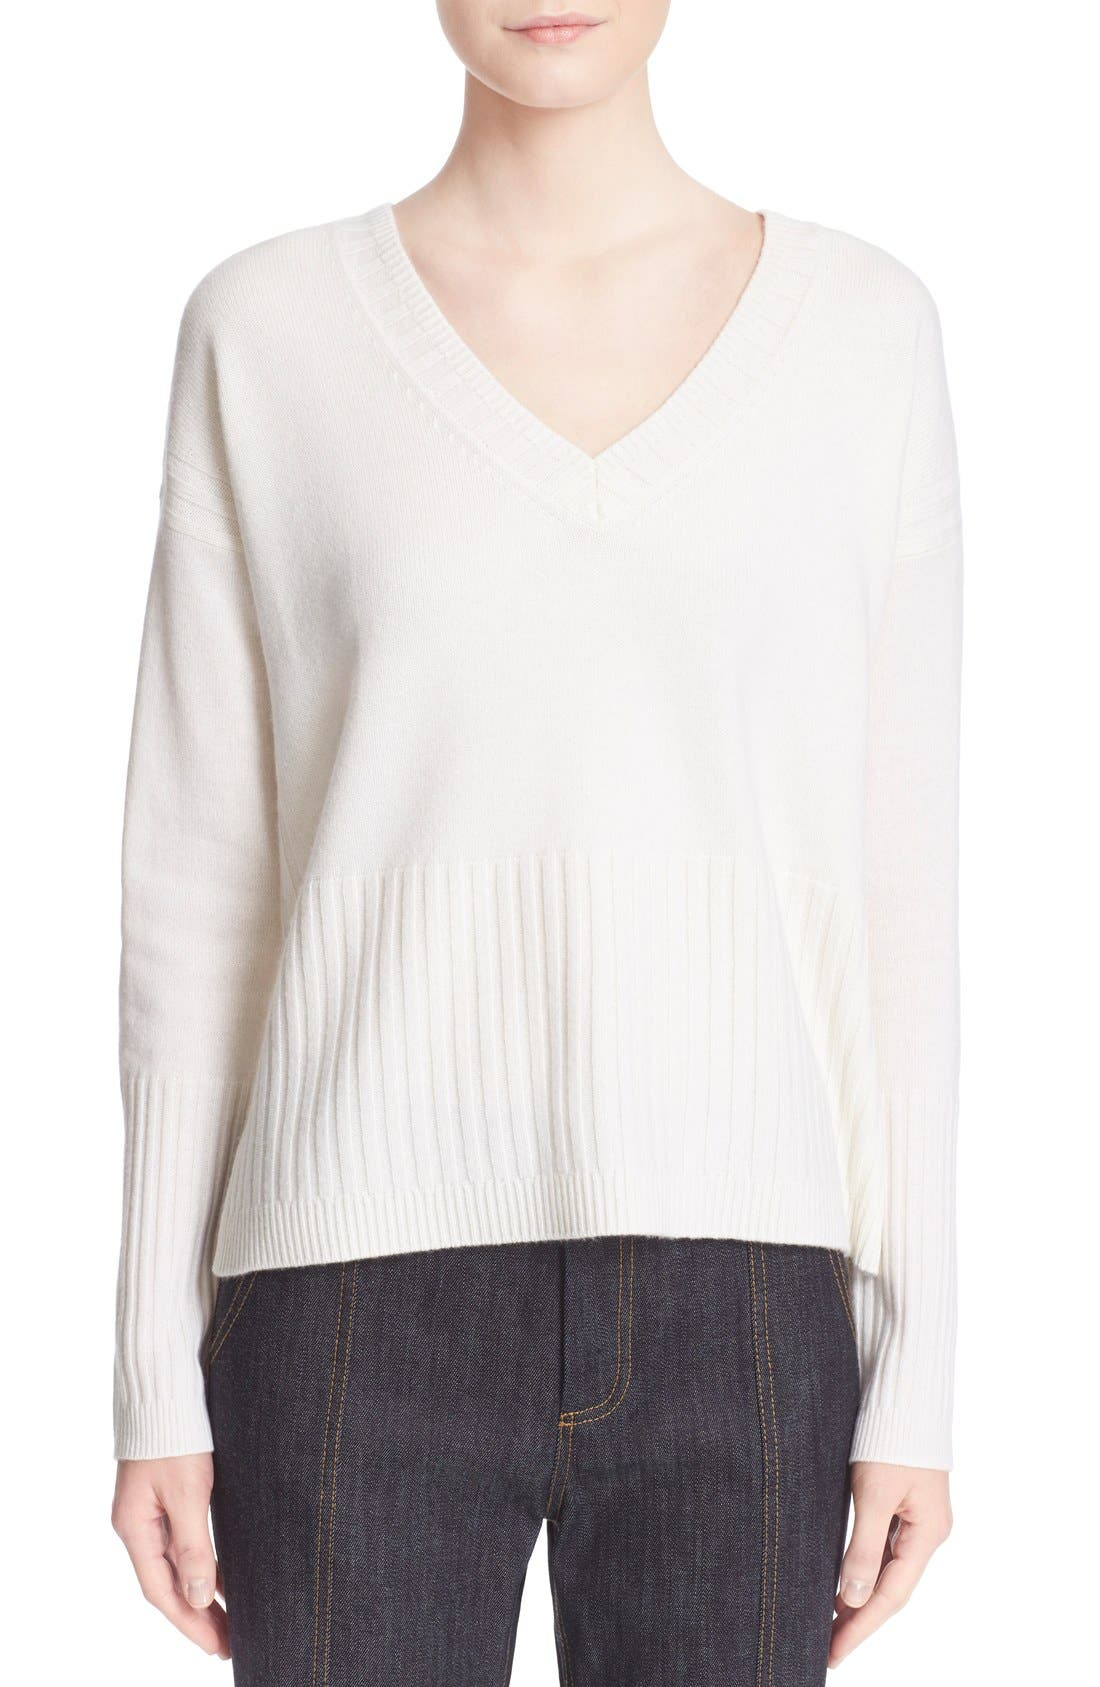 Alternate Image 1 Selected - Derek Lam 10 Crosby V-Neck Cashmere Sweater